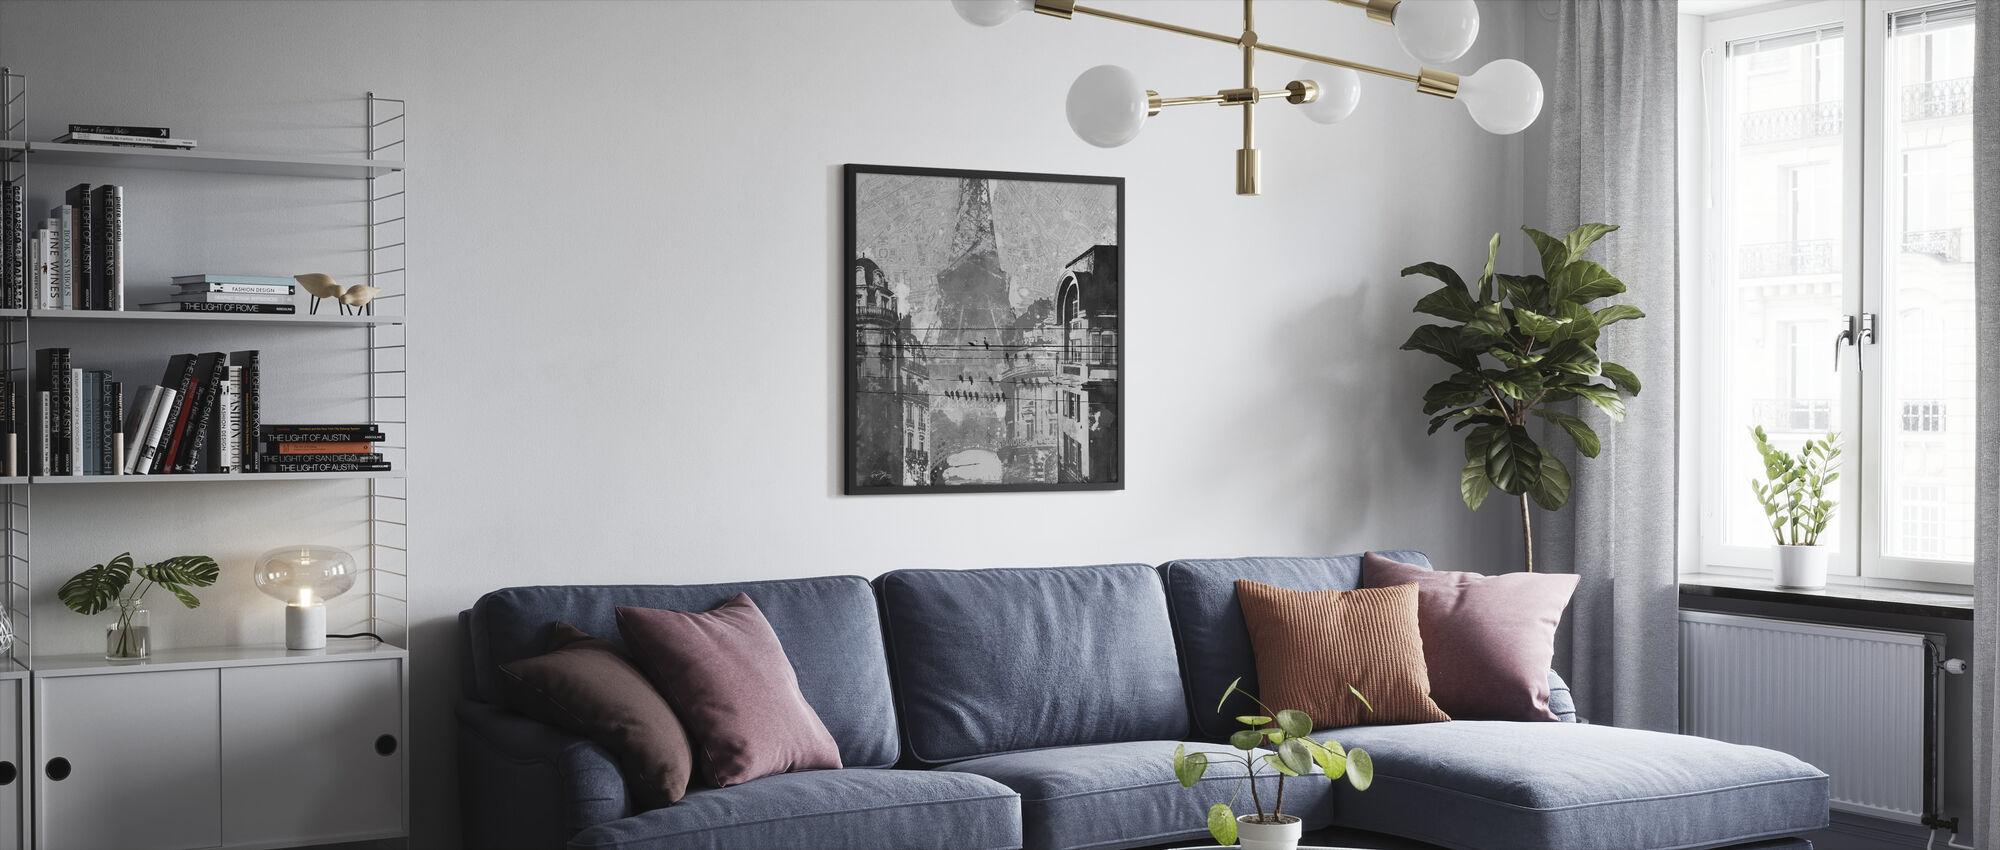 Birds of Paris - Framed print - Living Room